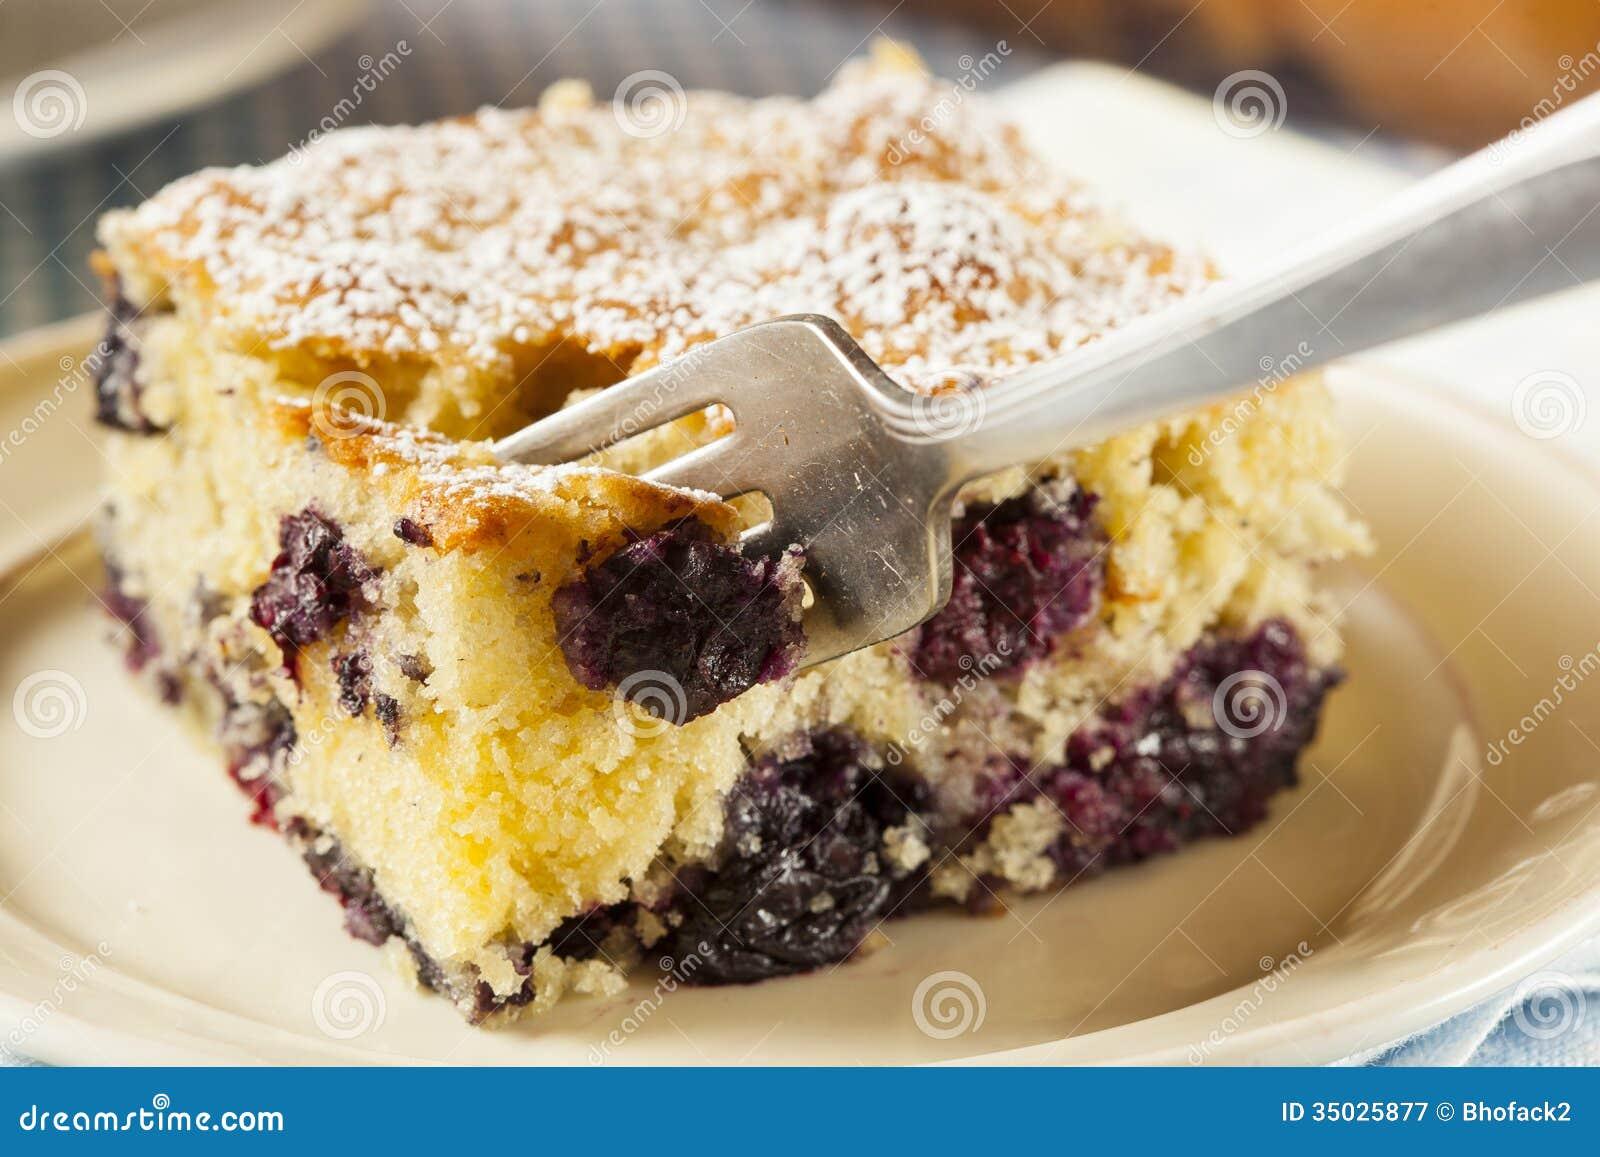 Mr Food Blueberry Coffee Cake